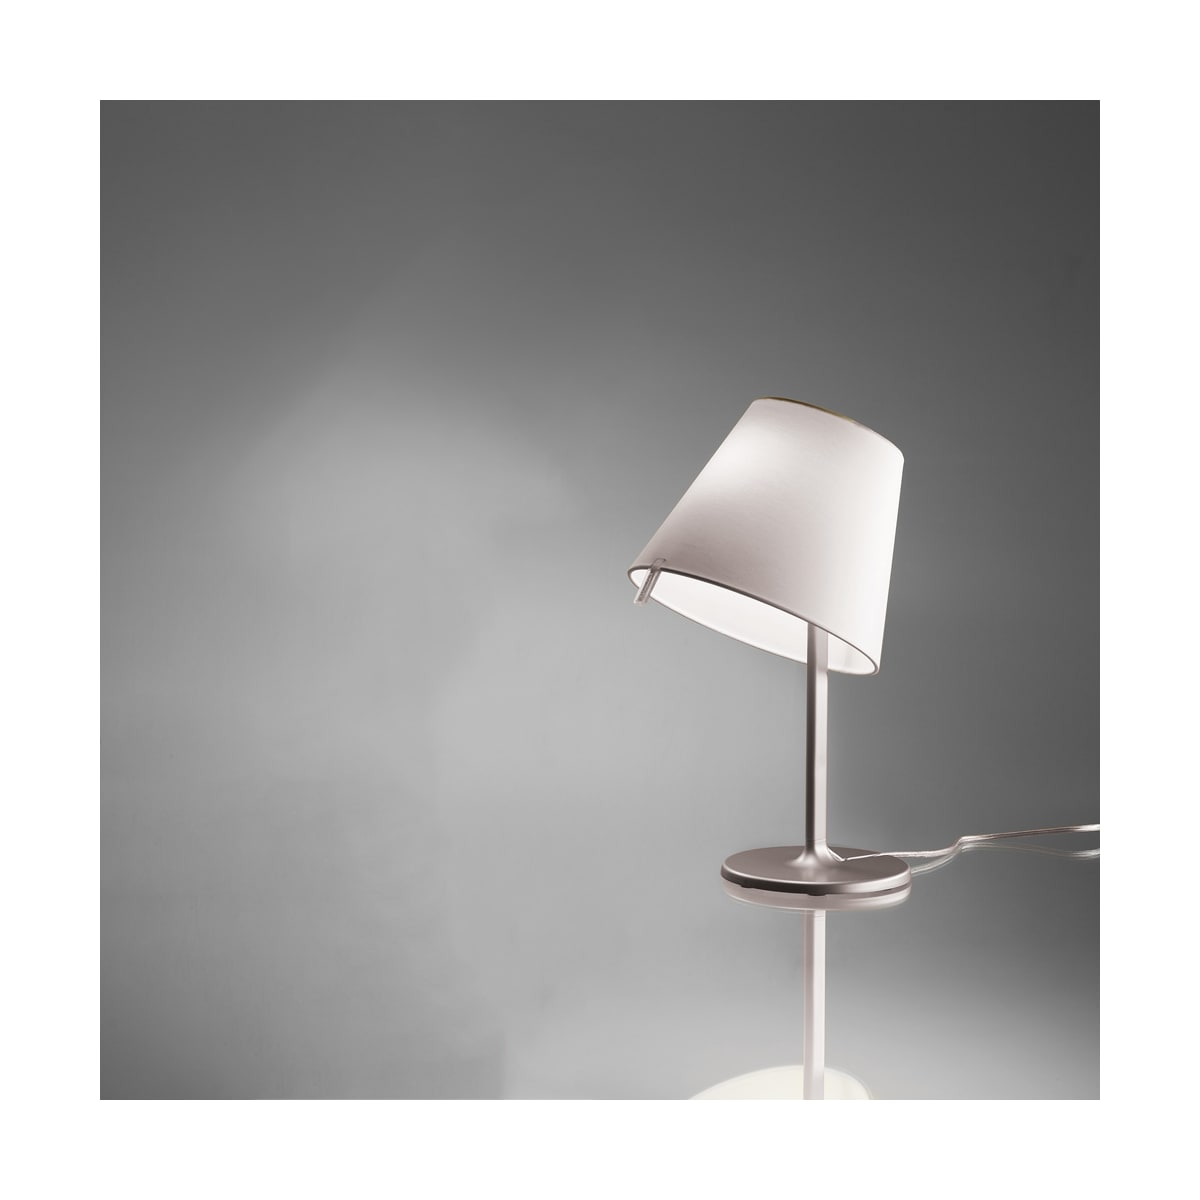 Artemide Usc 0710028a Bronze Melampo Single Light 15 3 4 Tall Table Lamp Lightingshowplace Com